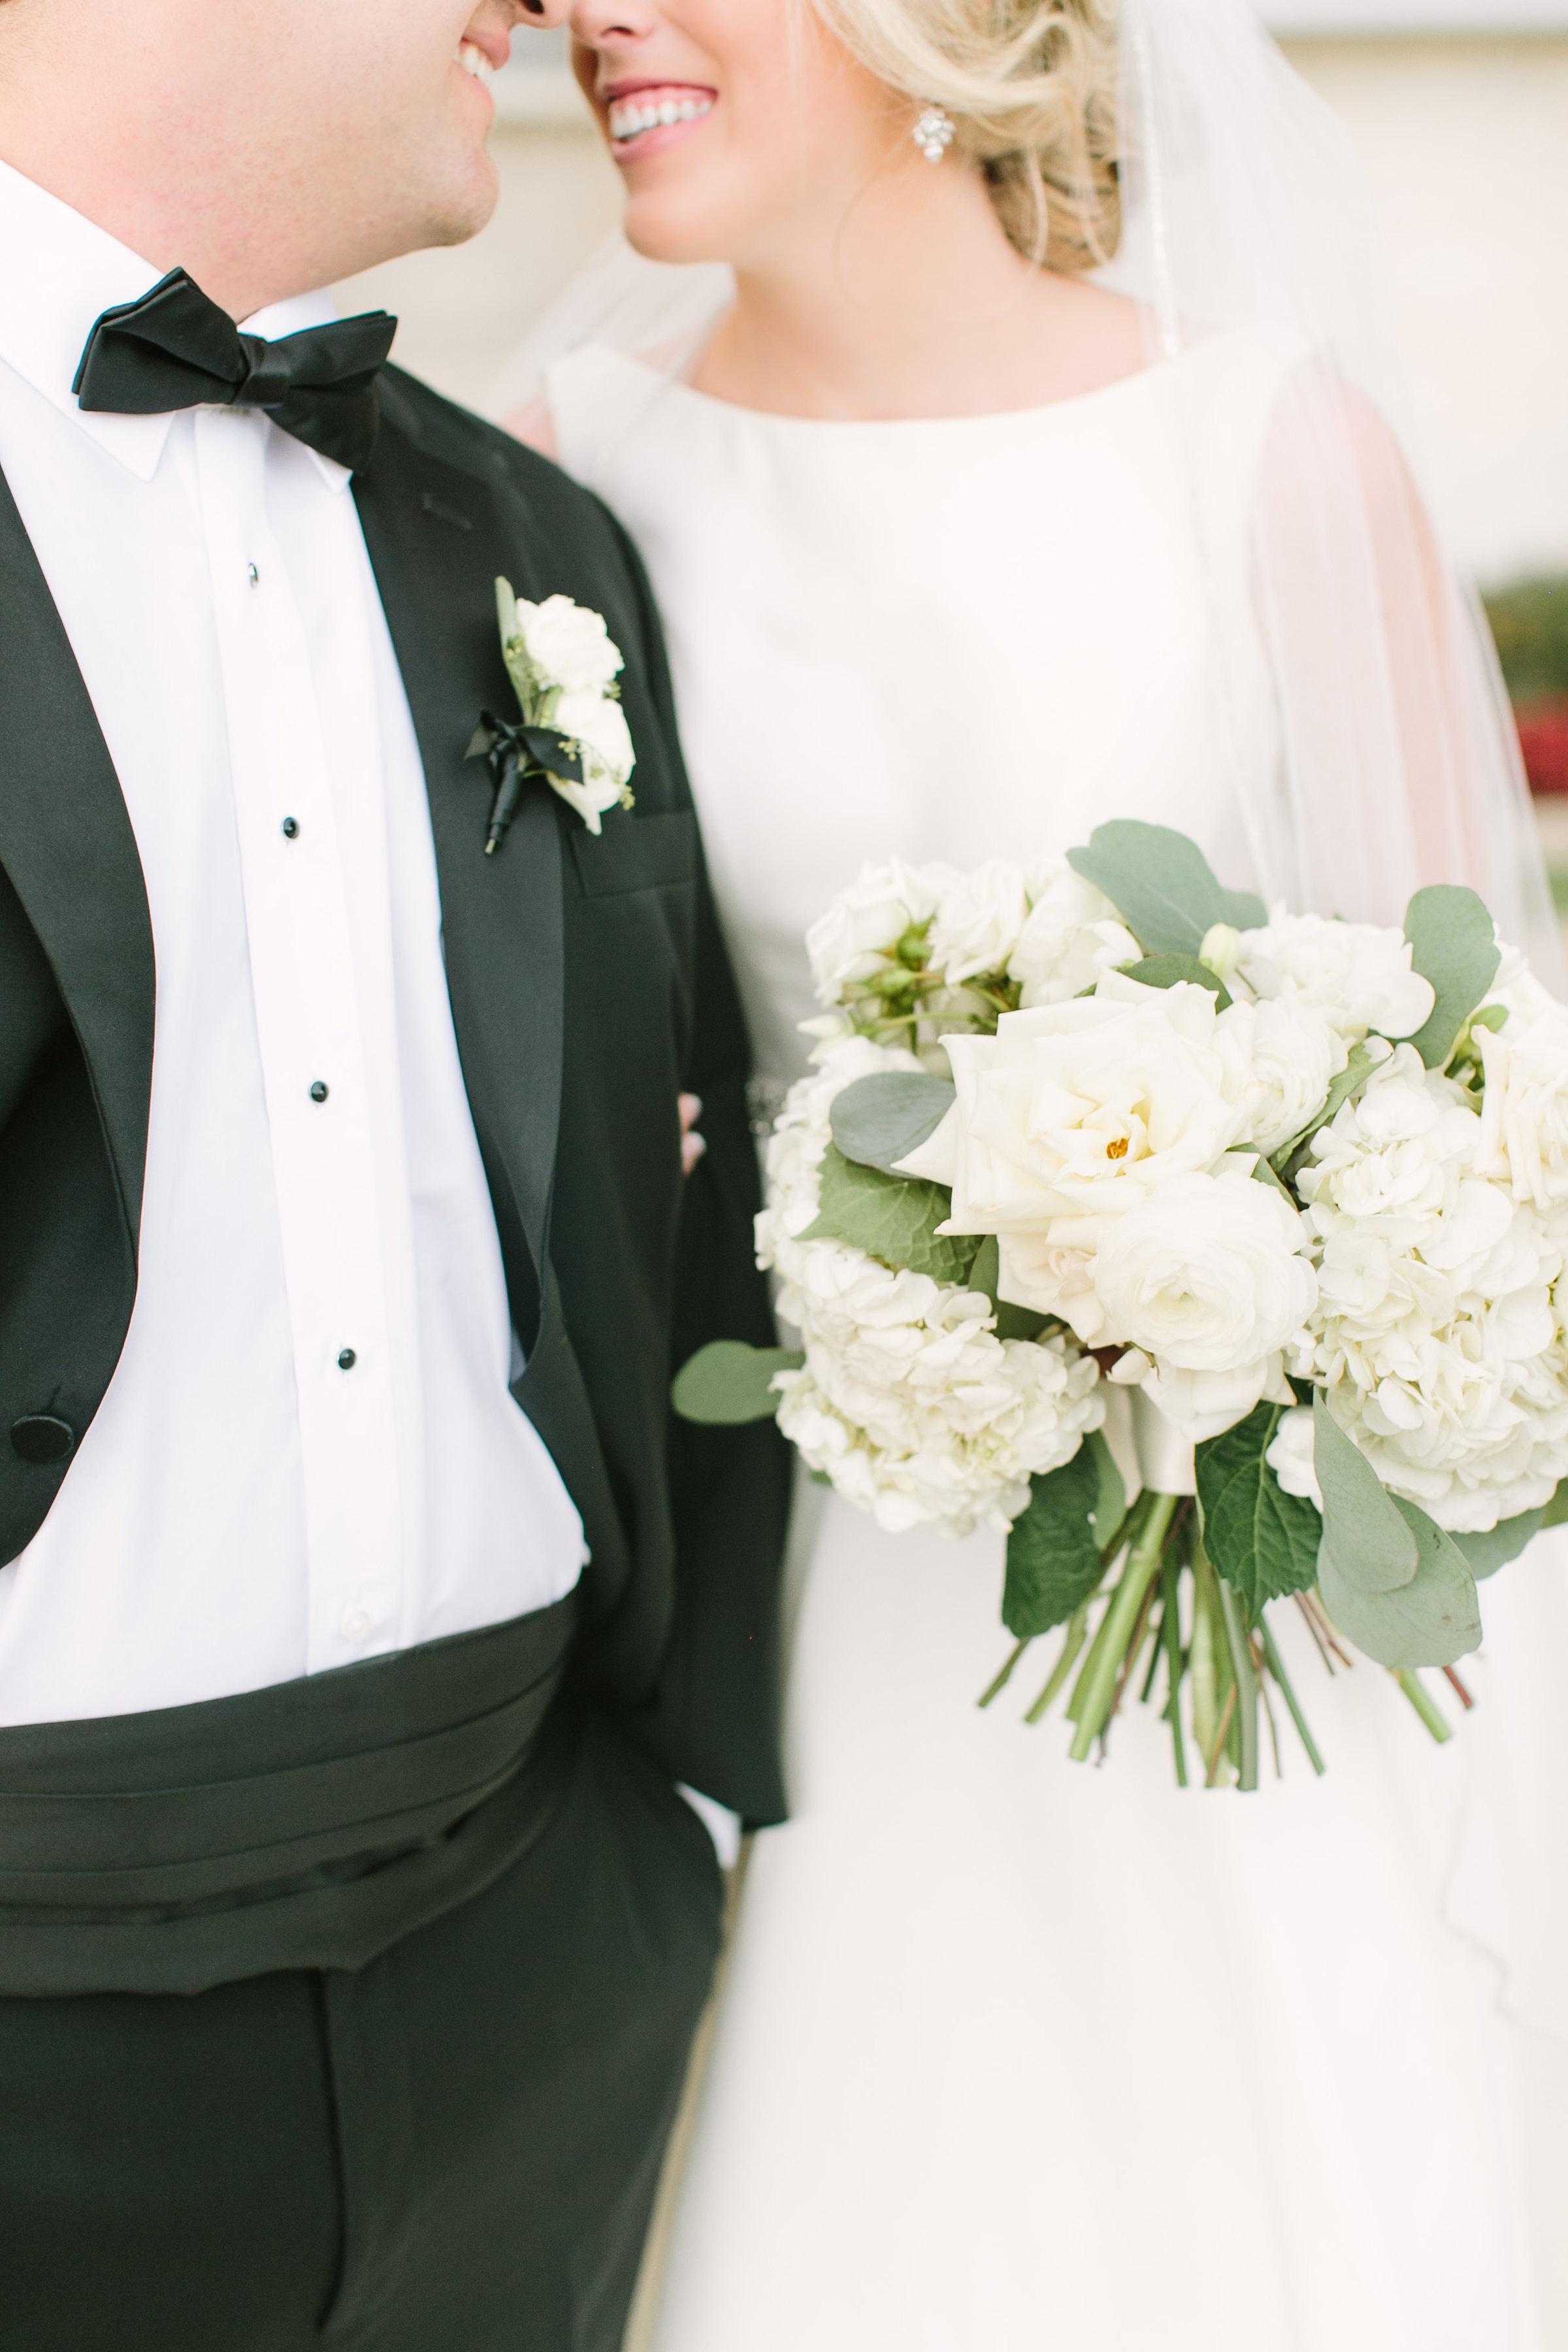 bride-groom-love-wedding-white-bouquet-boutonniere-by-maxit-flower-design-in-houston-texas